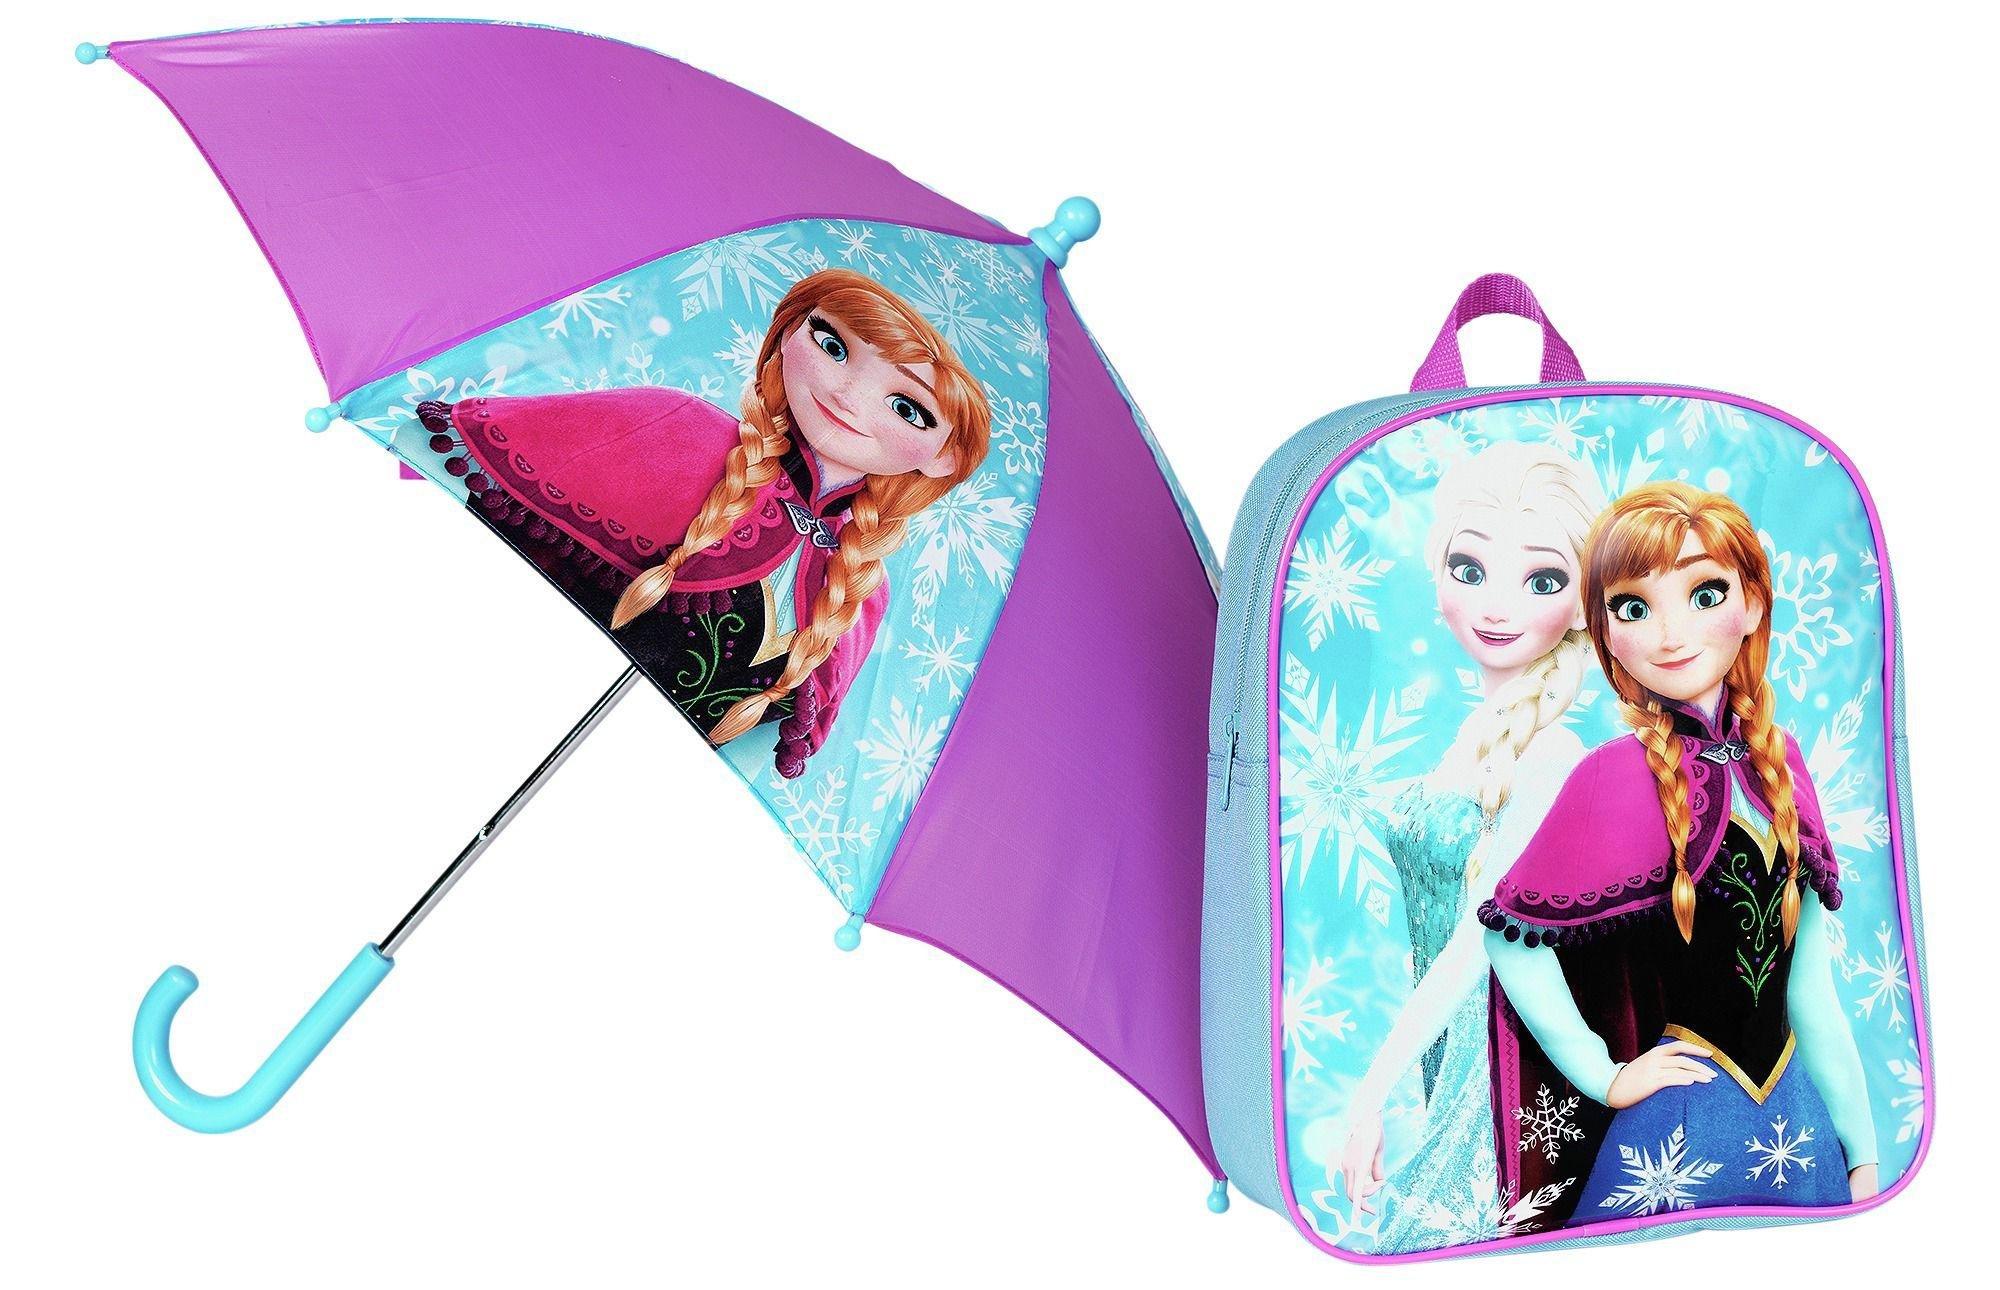 Image of Disney Frozen Backpack and Umbrella Set